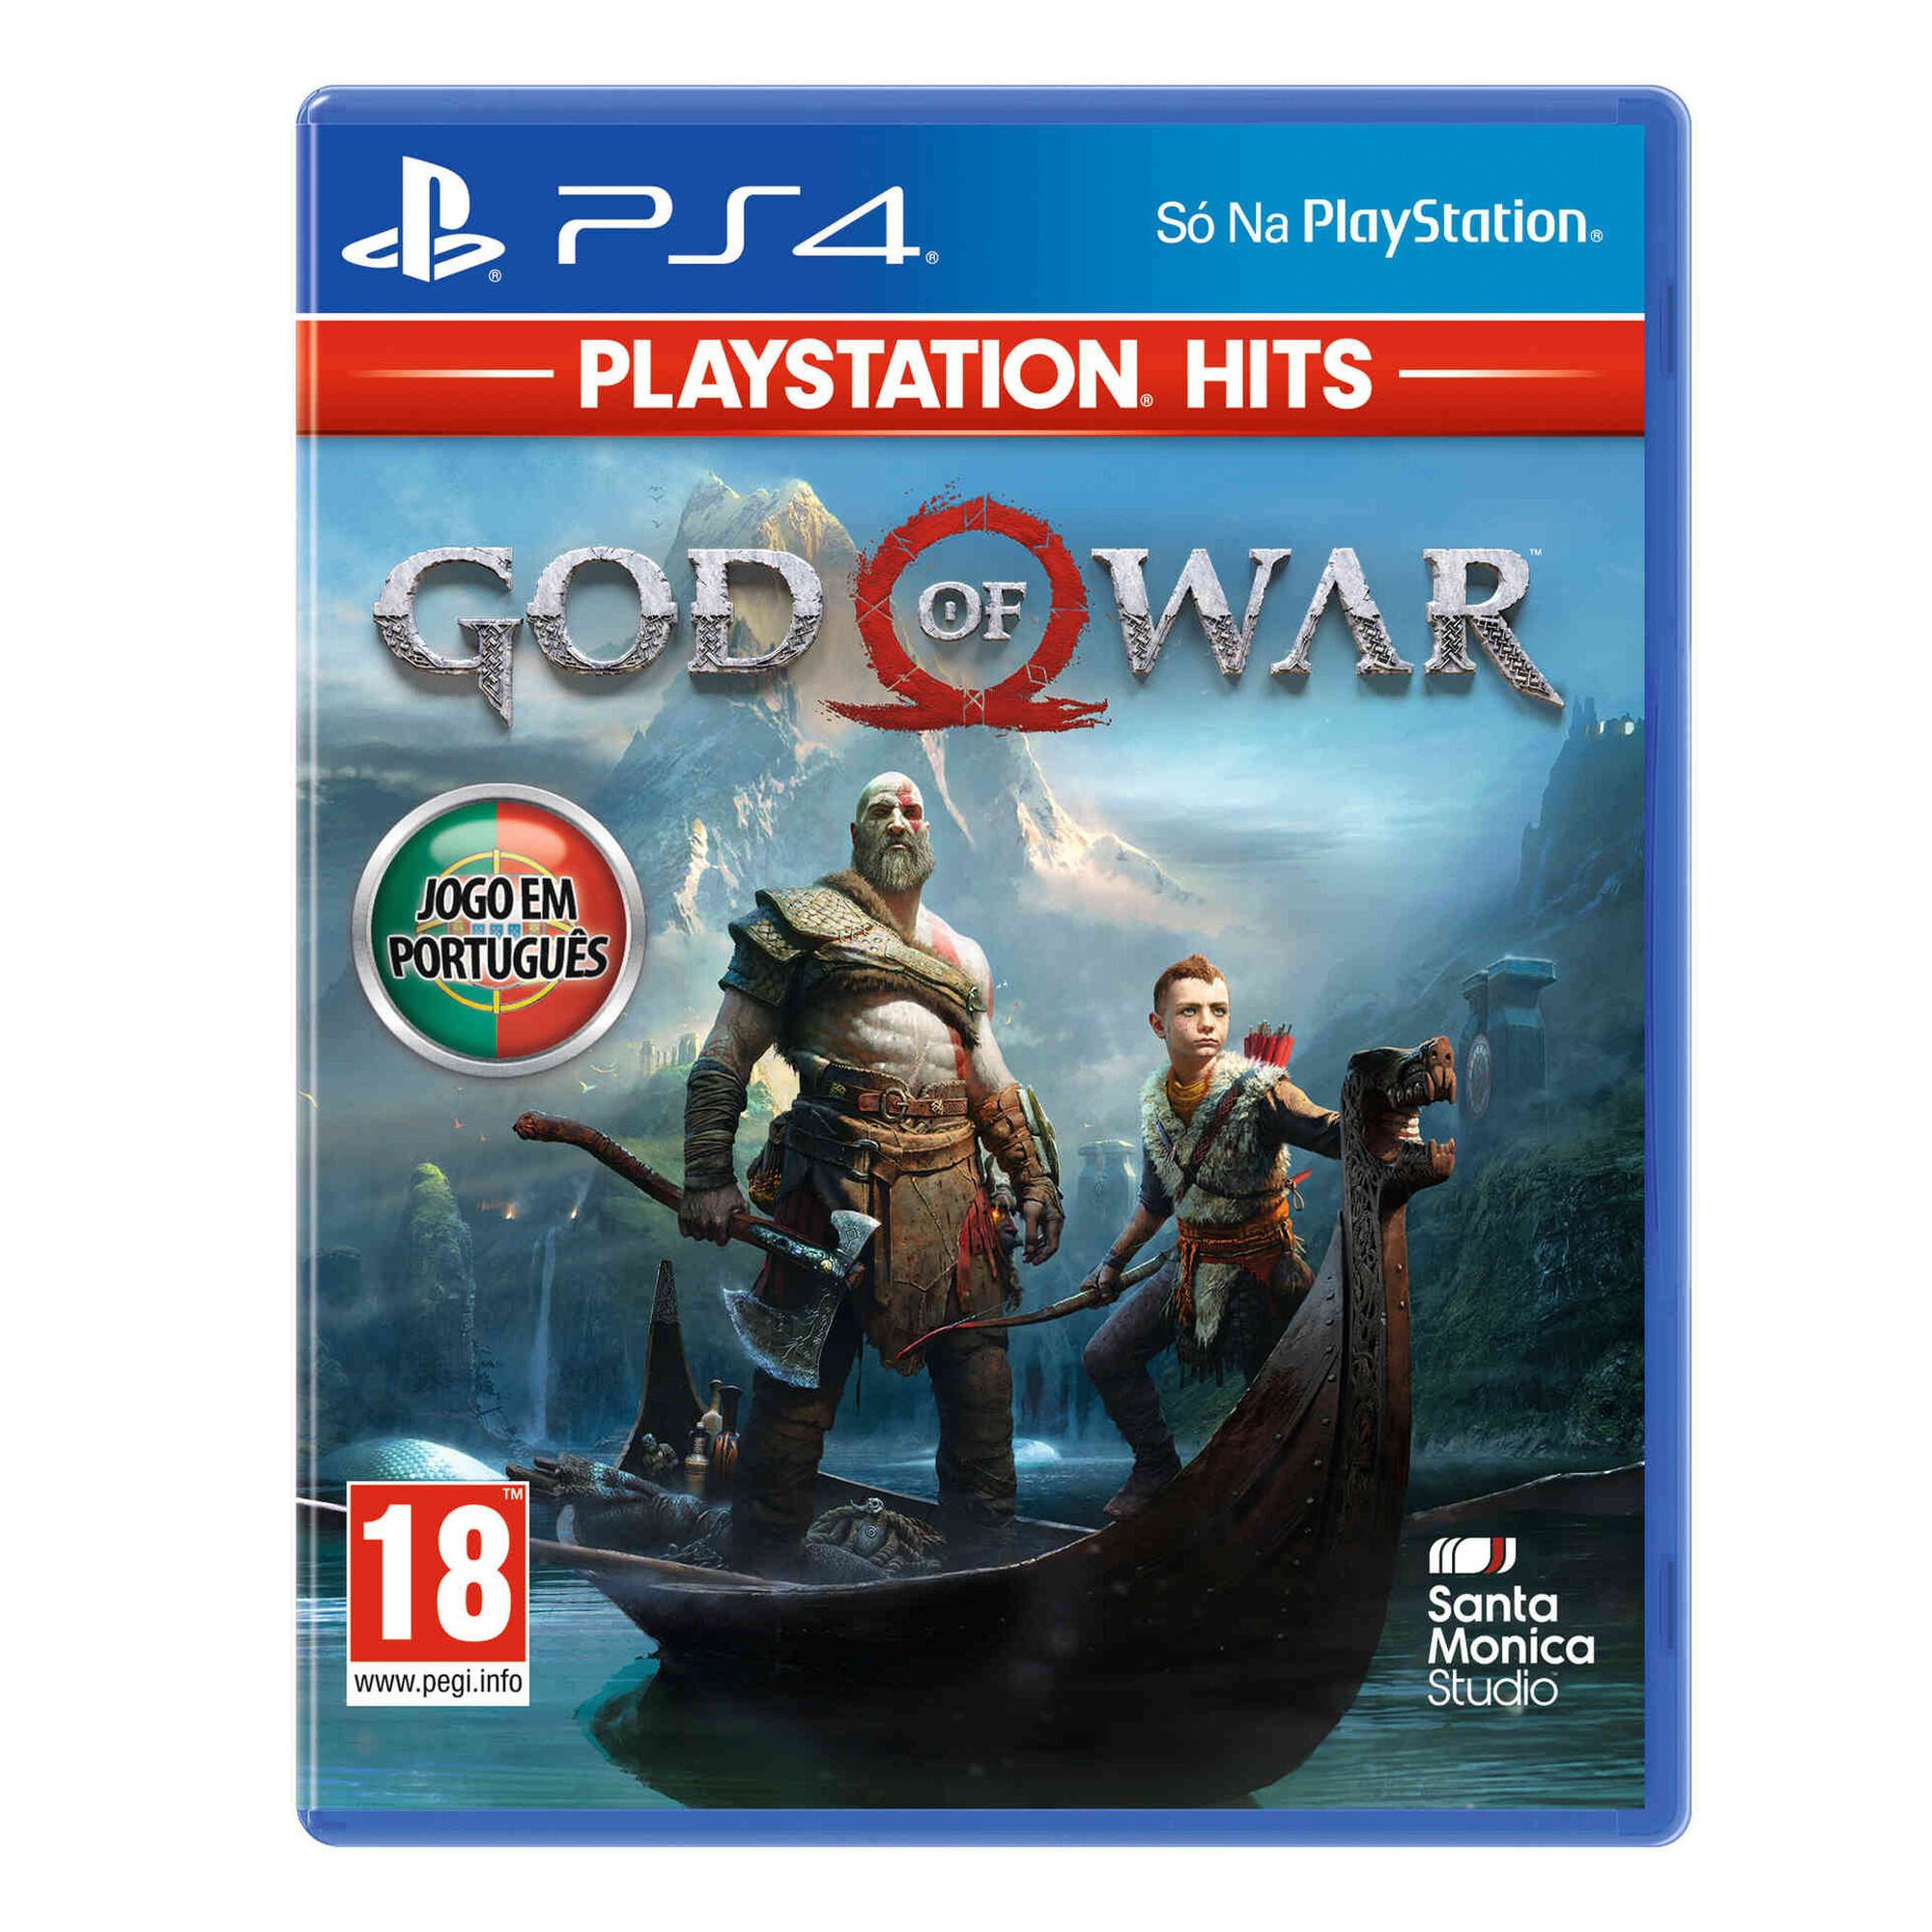 Jogo Sony PS4 God of War Hits